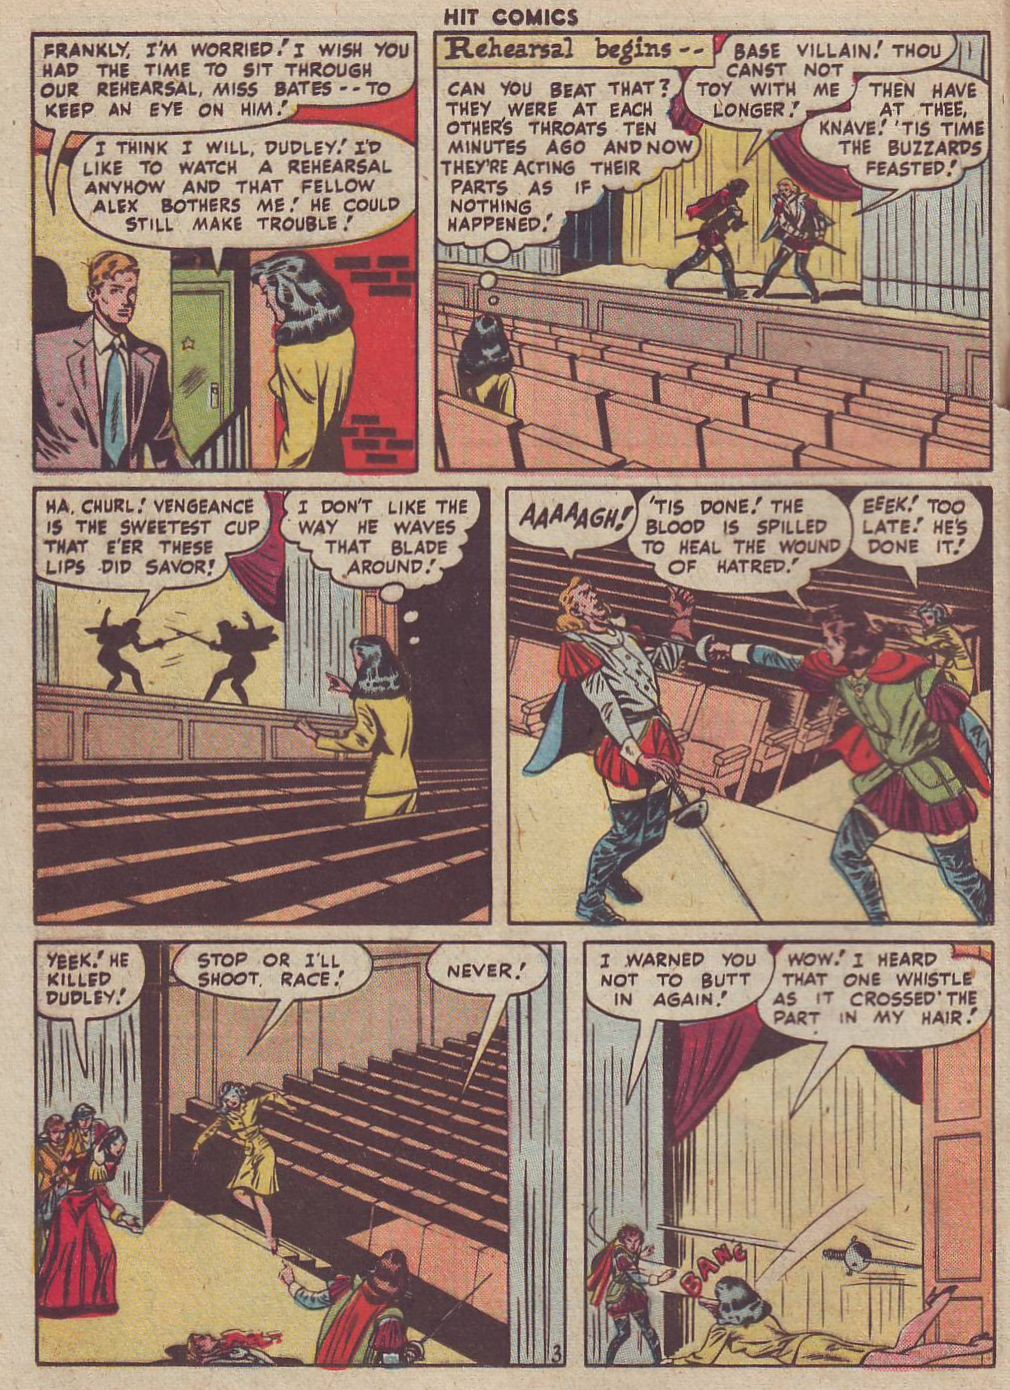 Read online Hit Comics comic -  Issue #51 - 28